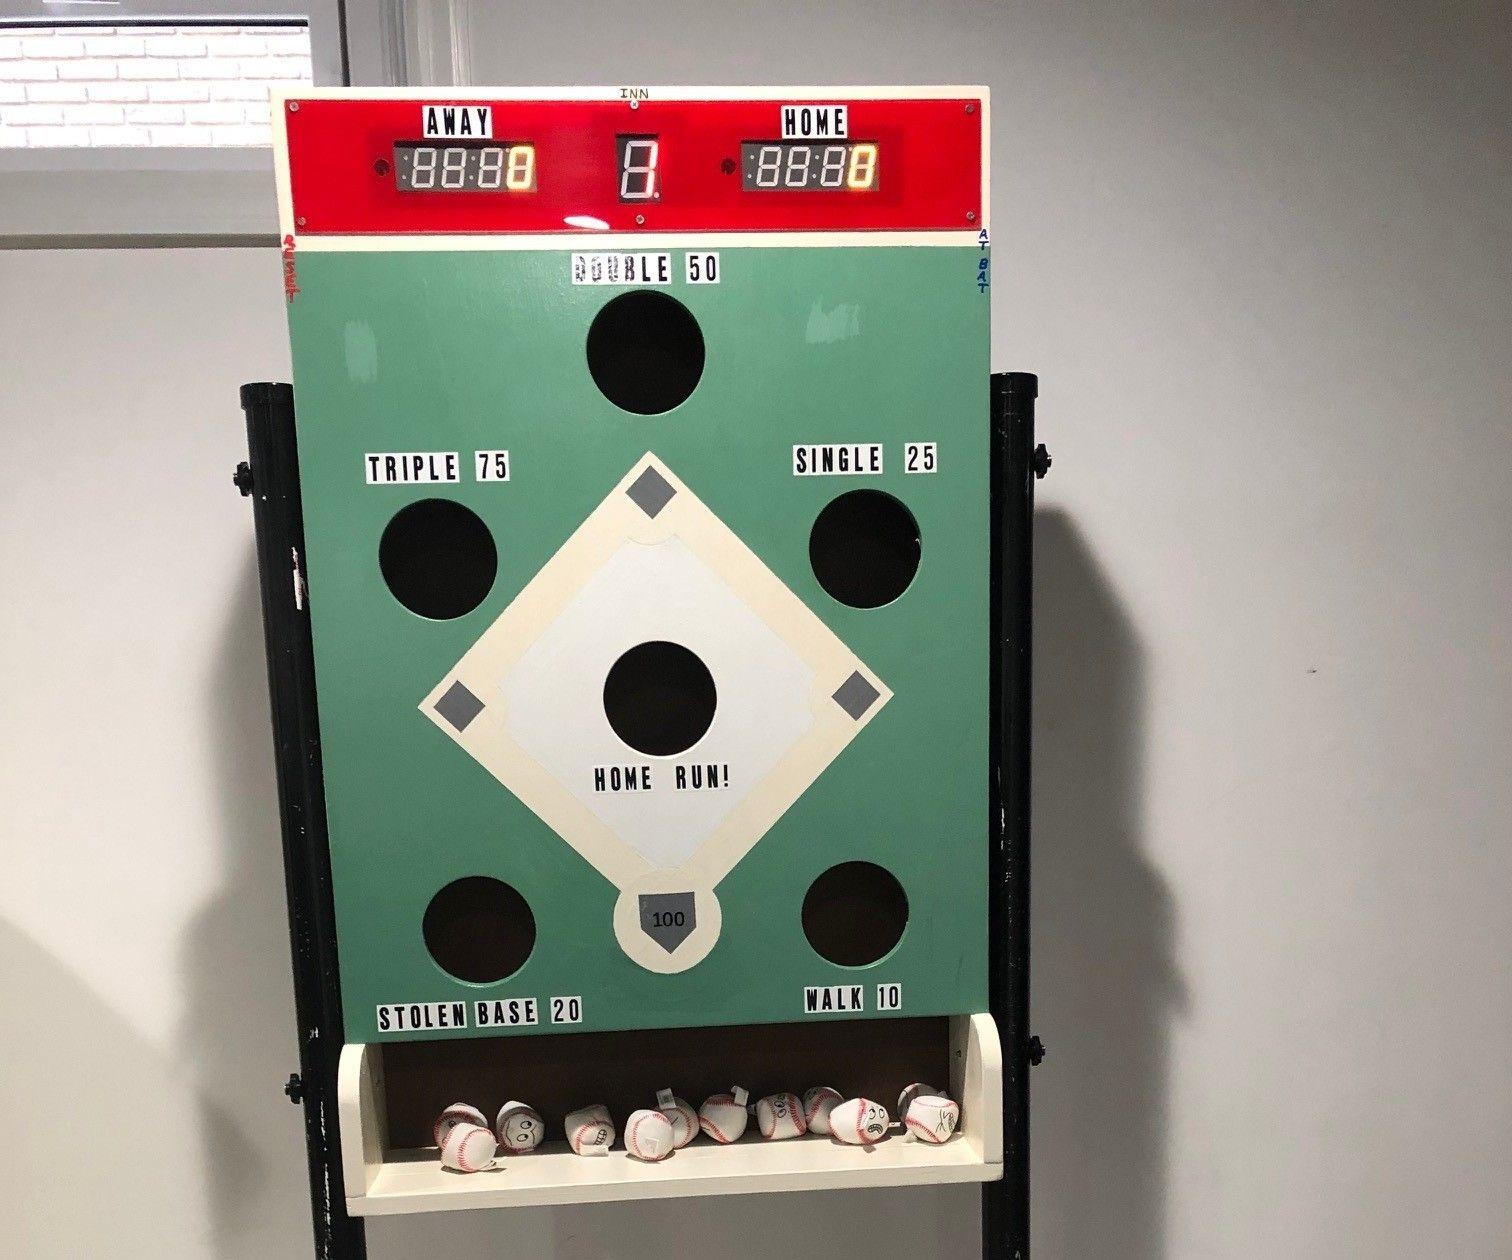 Electronic Scoring for a Bean Bag Toss Baseball Game